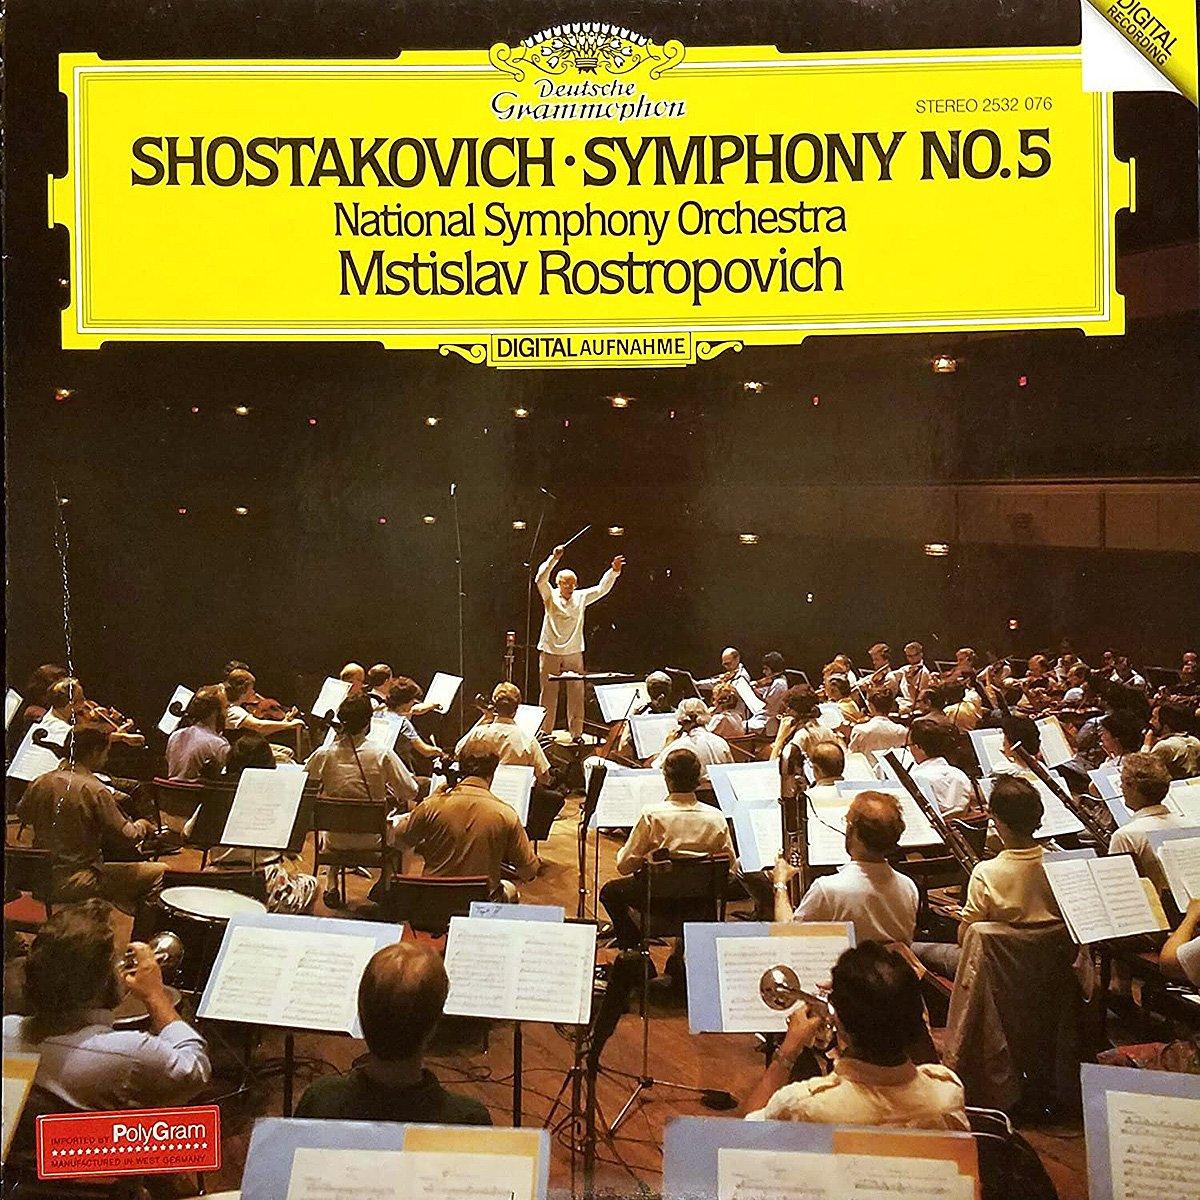 DGG 2532076 Shostakovich Symphonie 5 Rostropovich